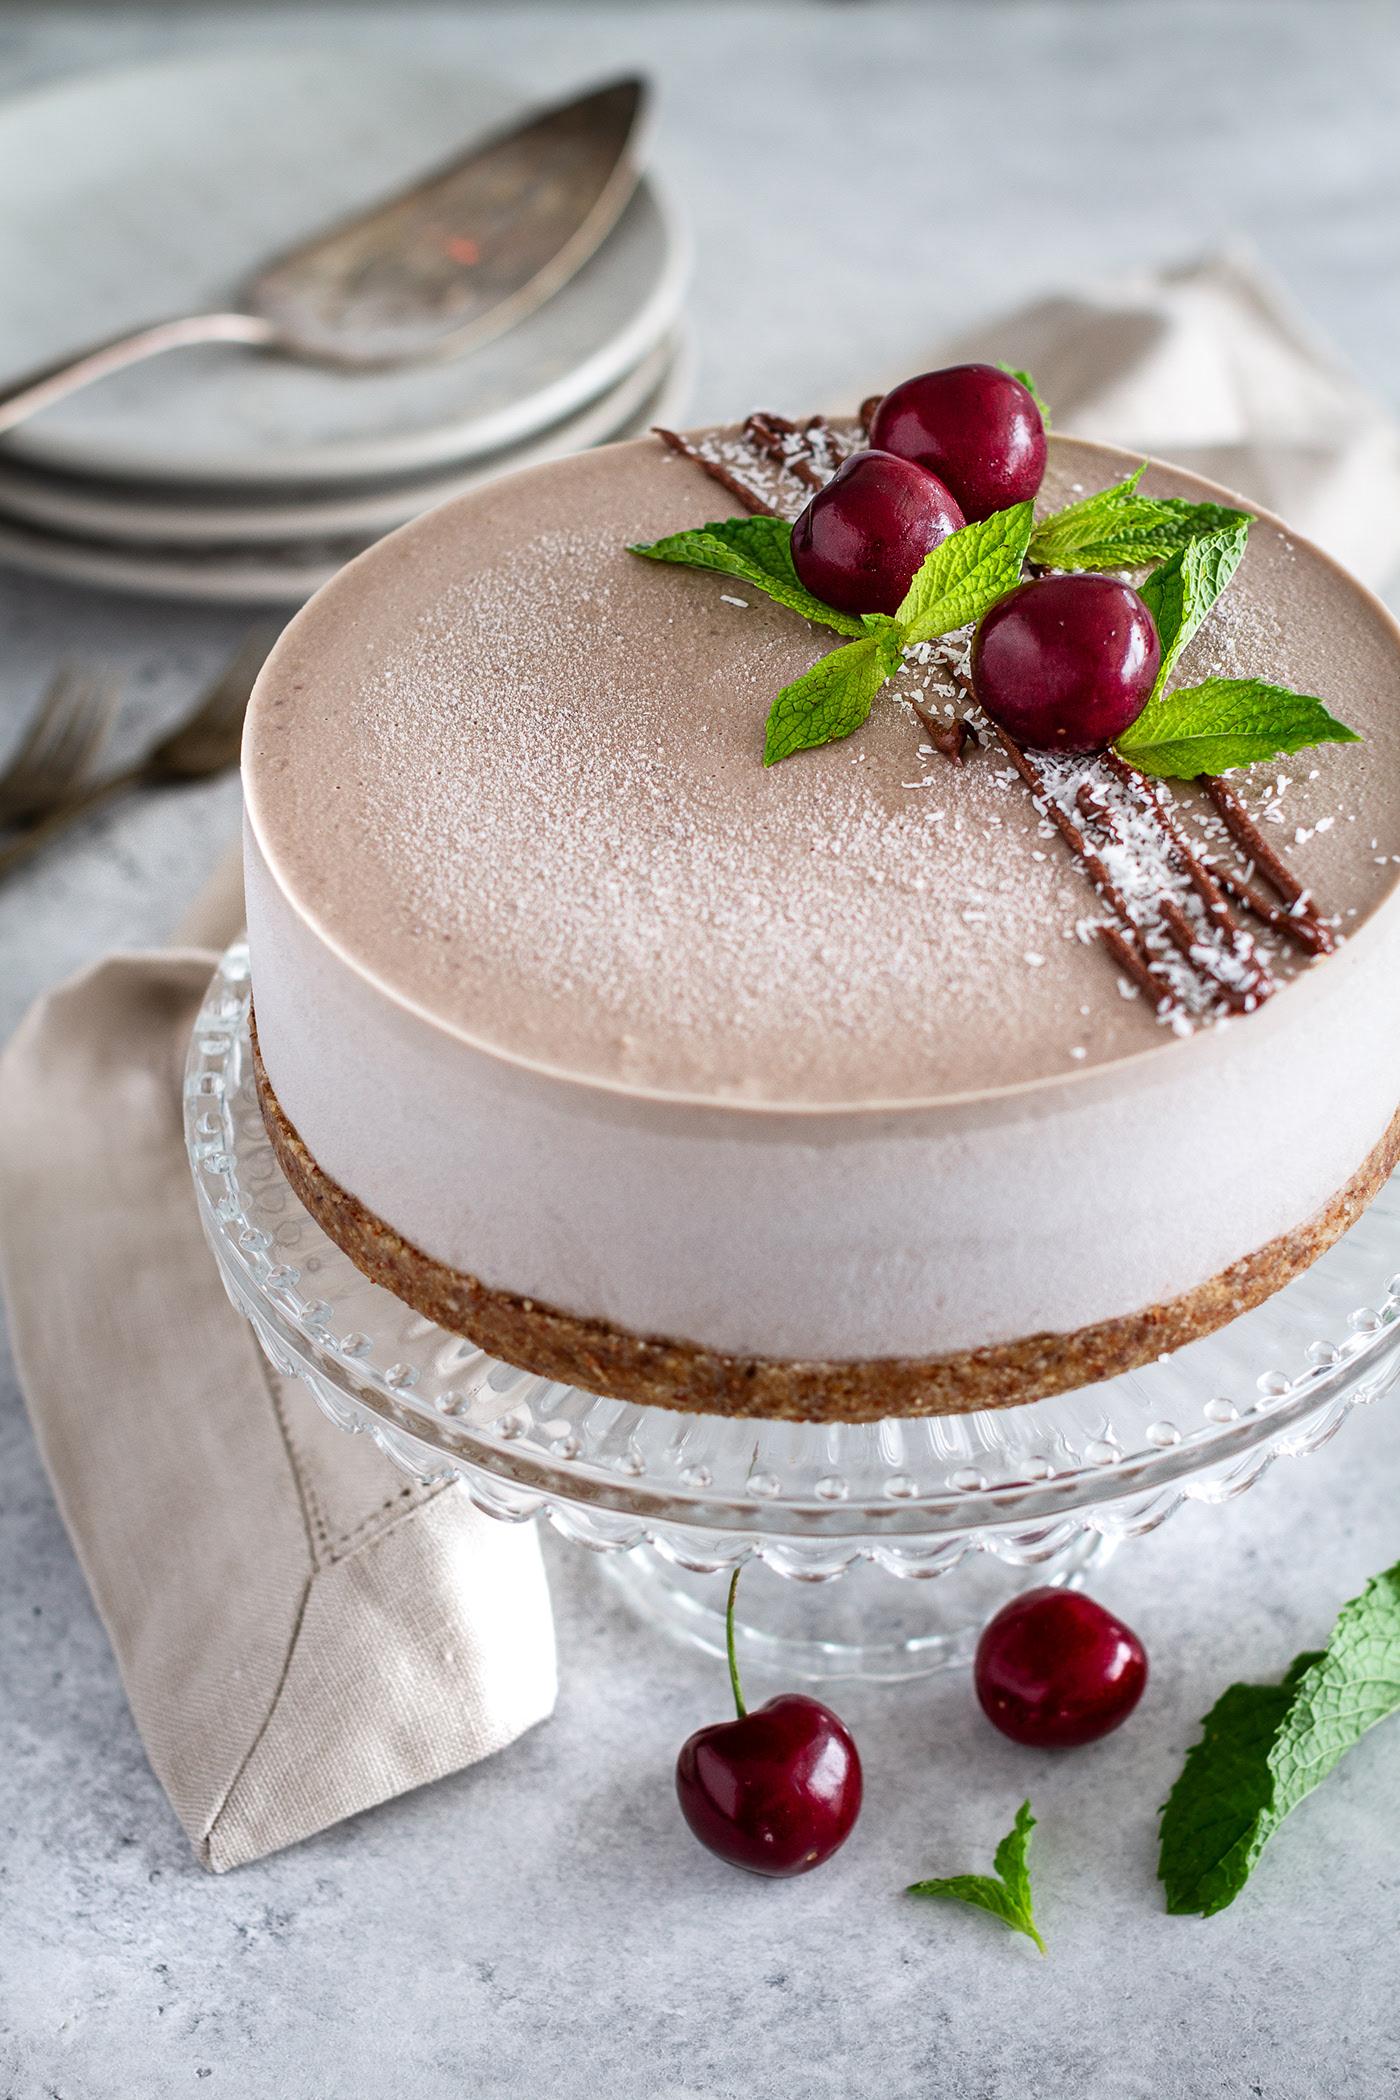 Vegan desserts shop / фотограф Julia Oro